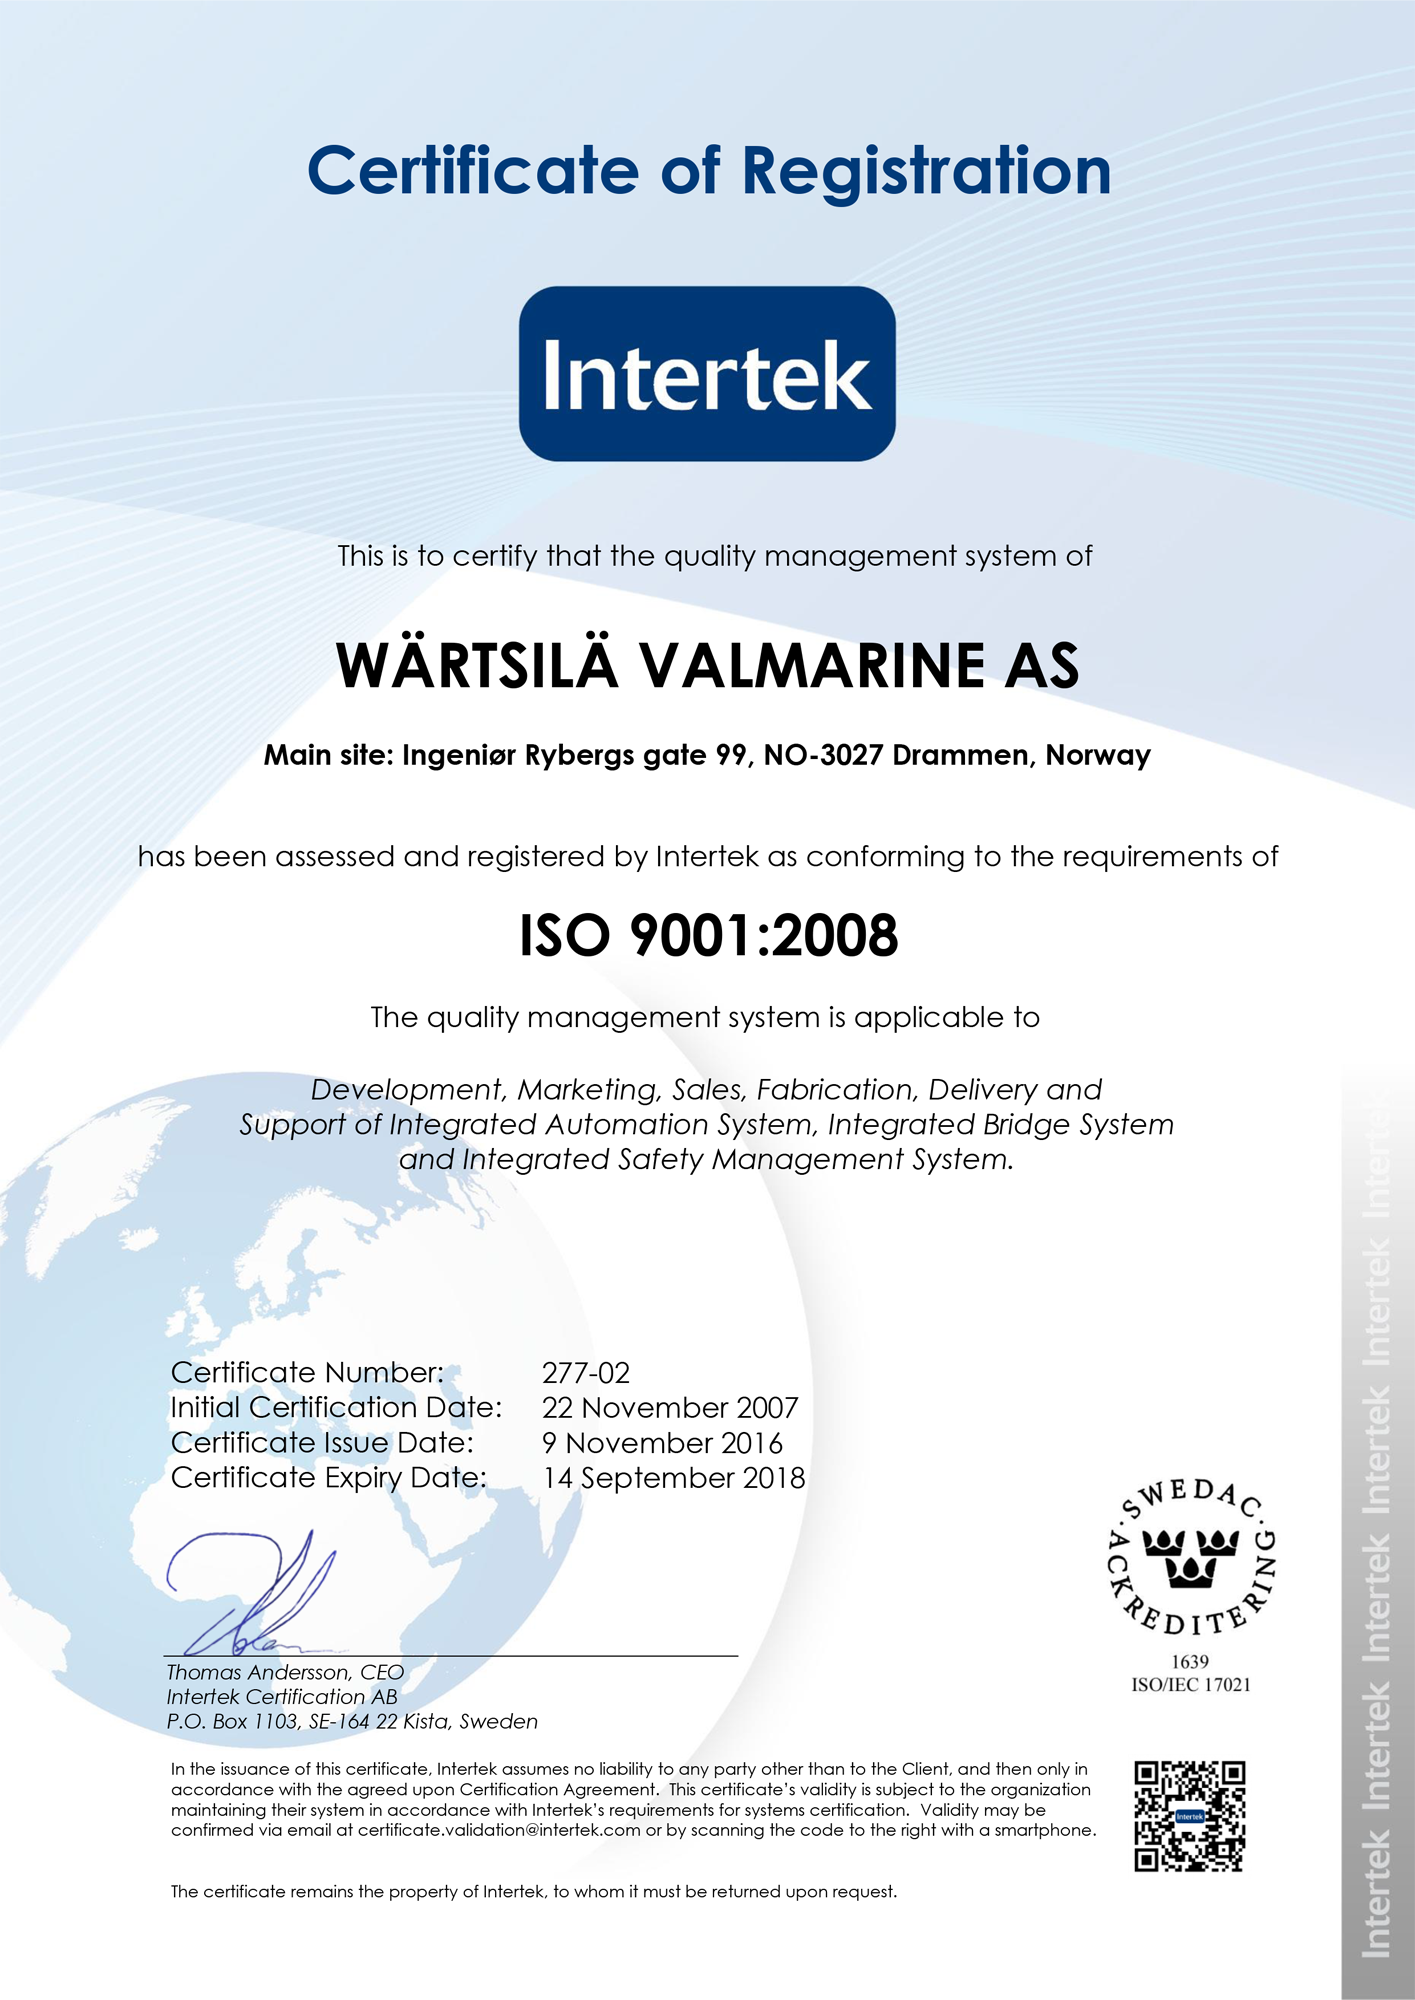 Valmarine-Certificate_9001_2008-nov16